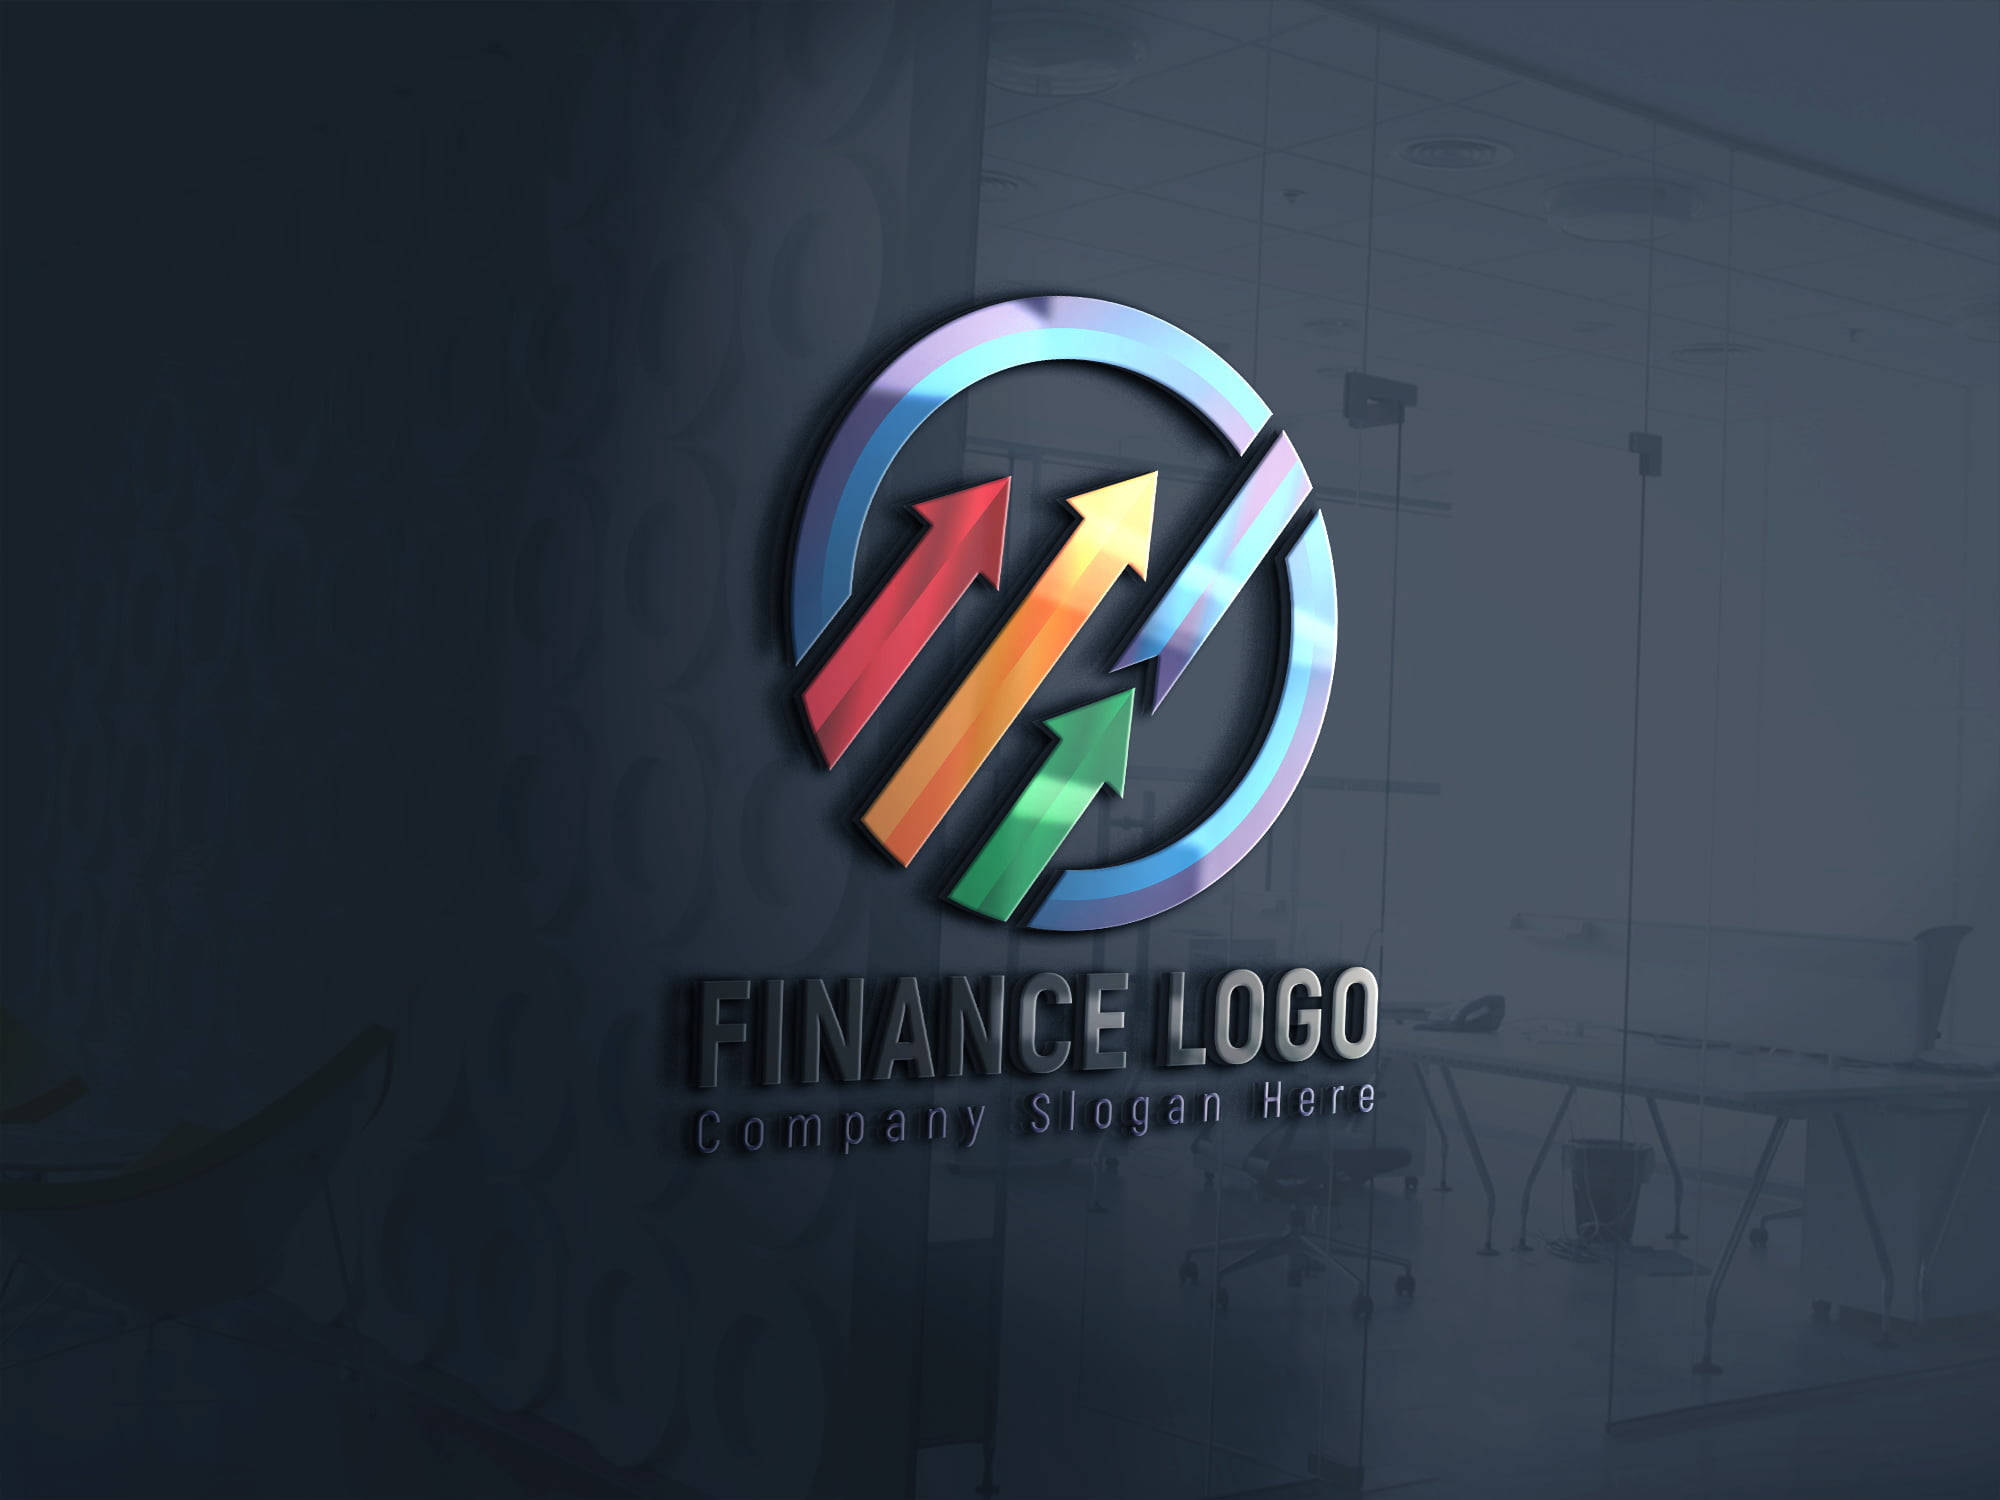 Finance Company Logo Design 3d glass window